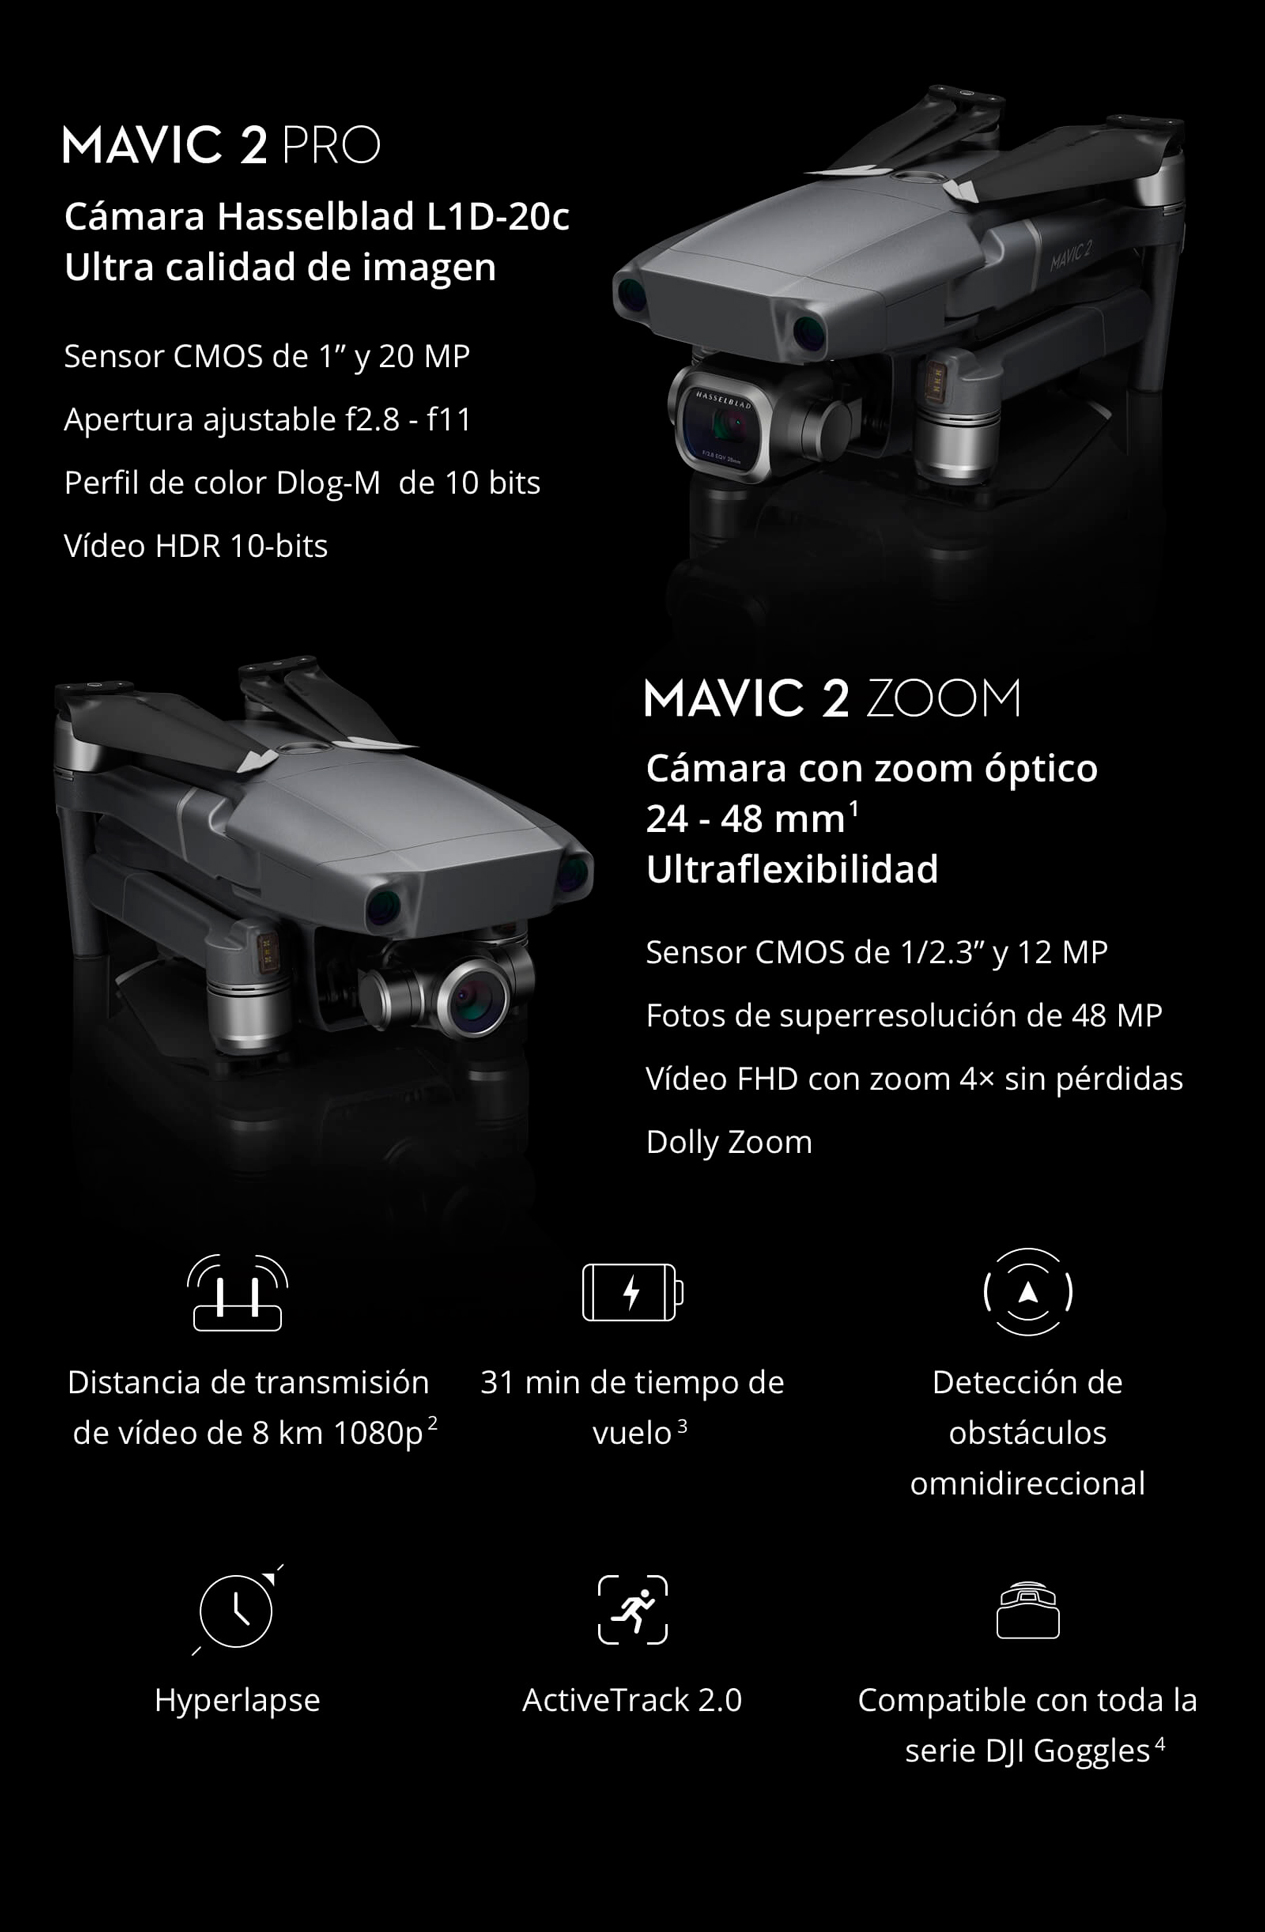 DJI MAVIC 2 PRO •Lente HASSELBLAD L1D-20c a f/2.8-f/11